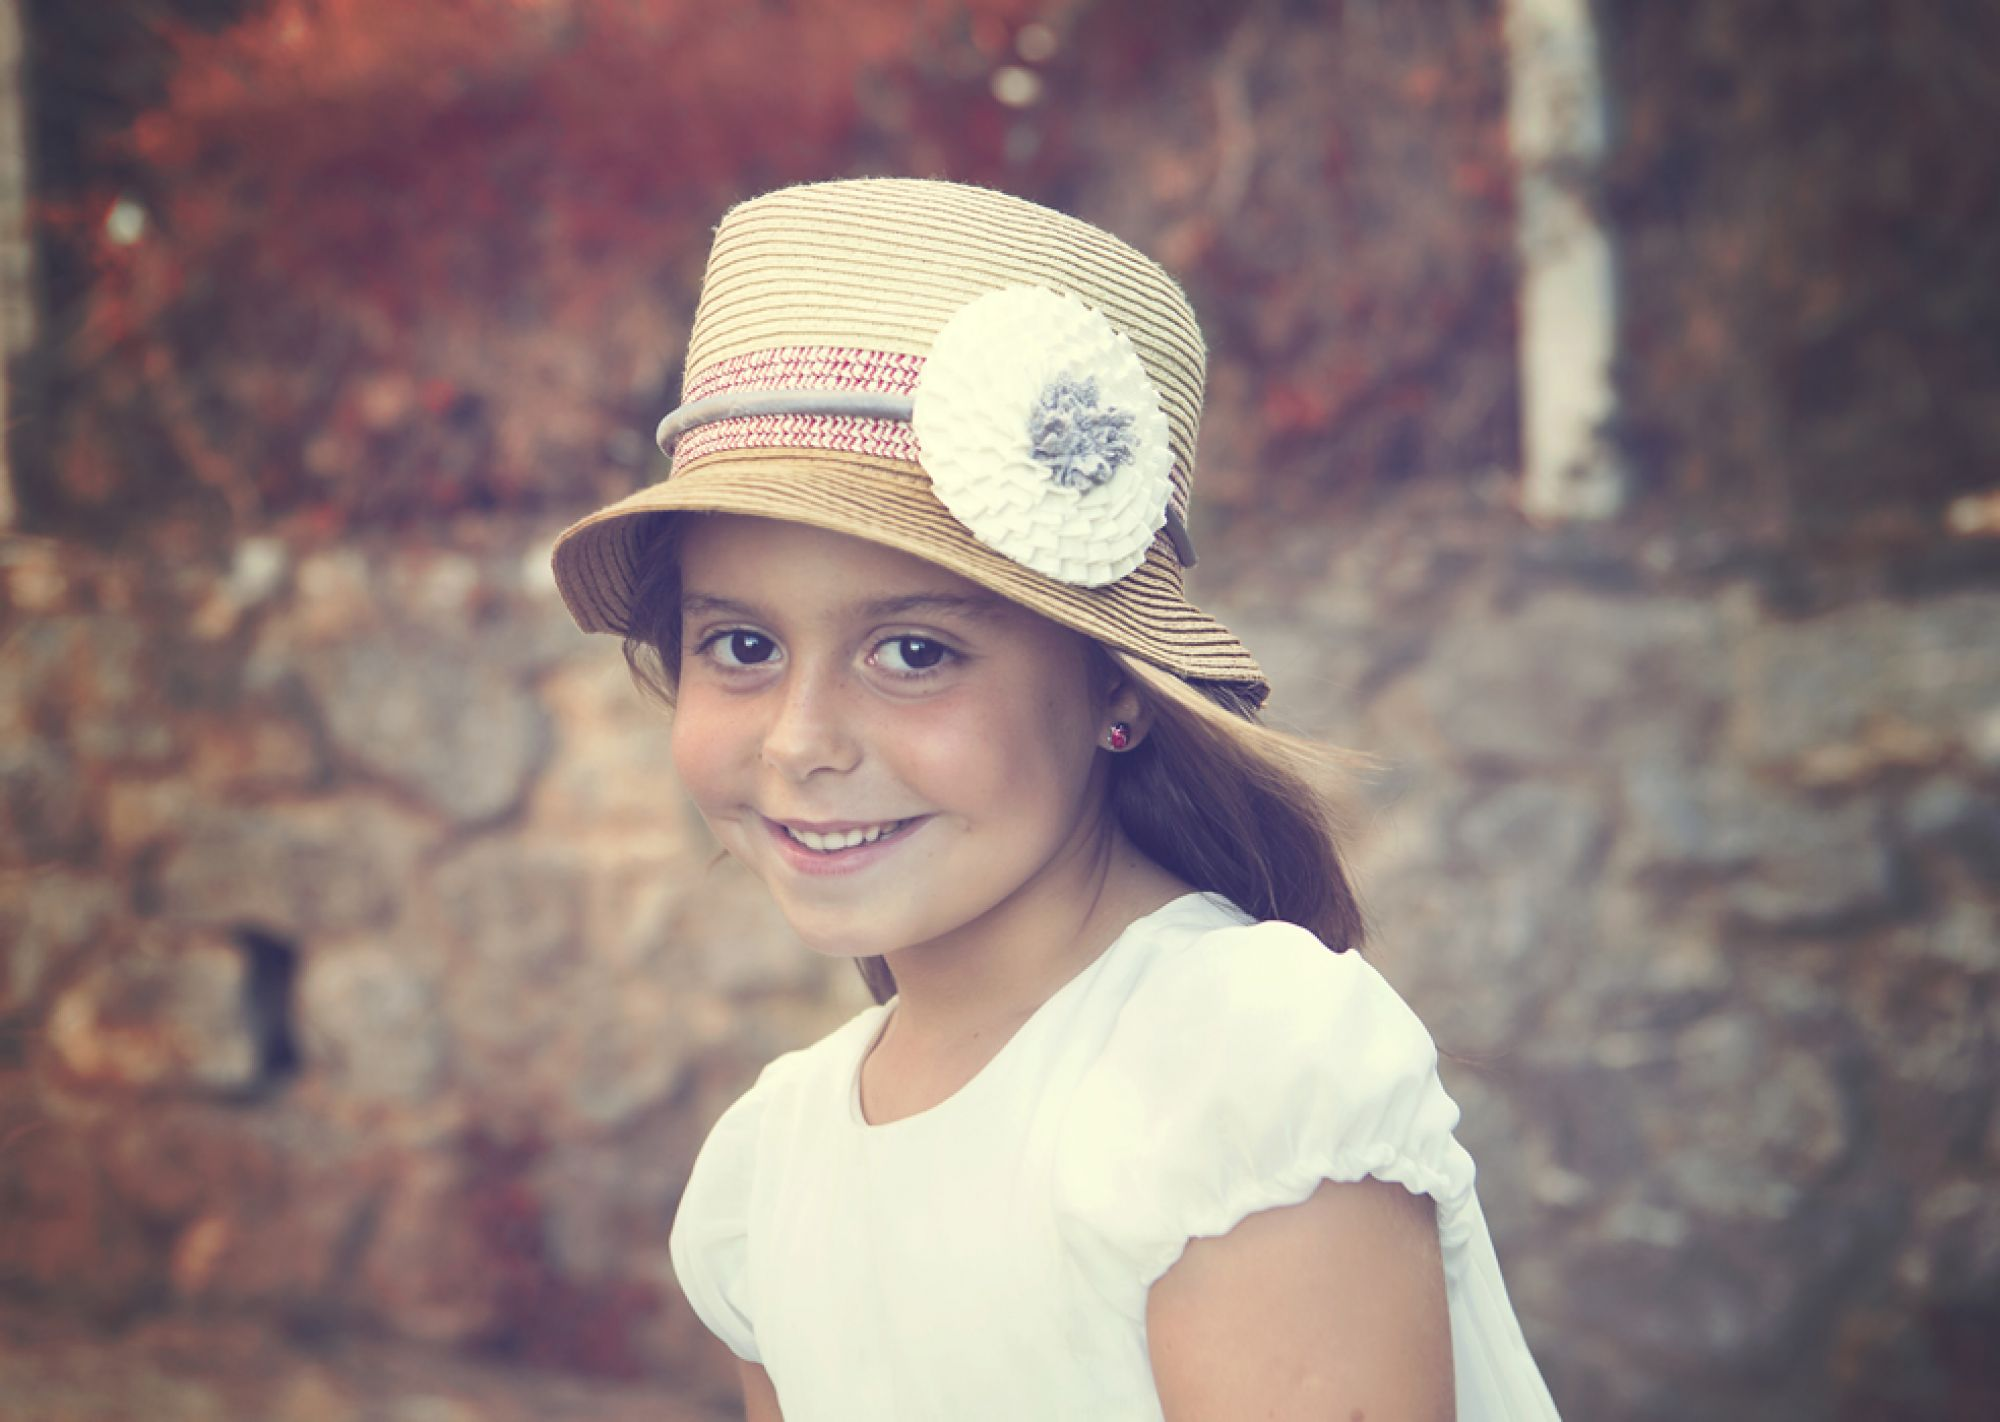 Reportaje fotos niños Bilbao